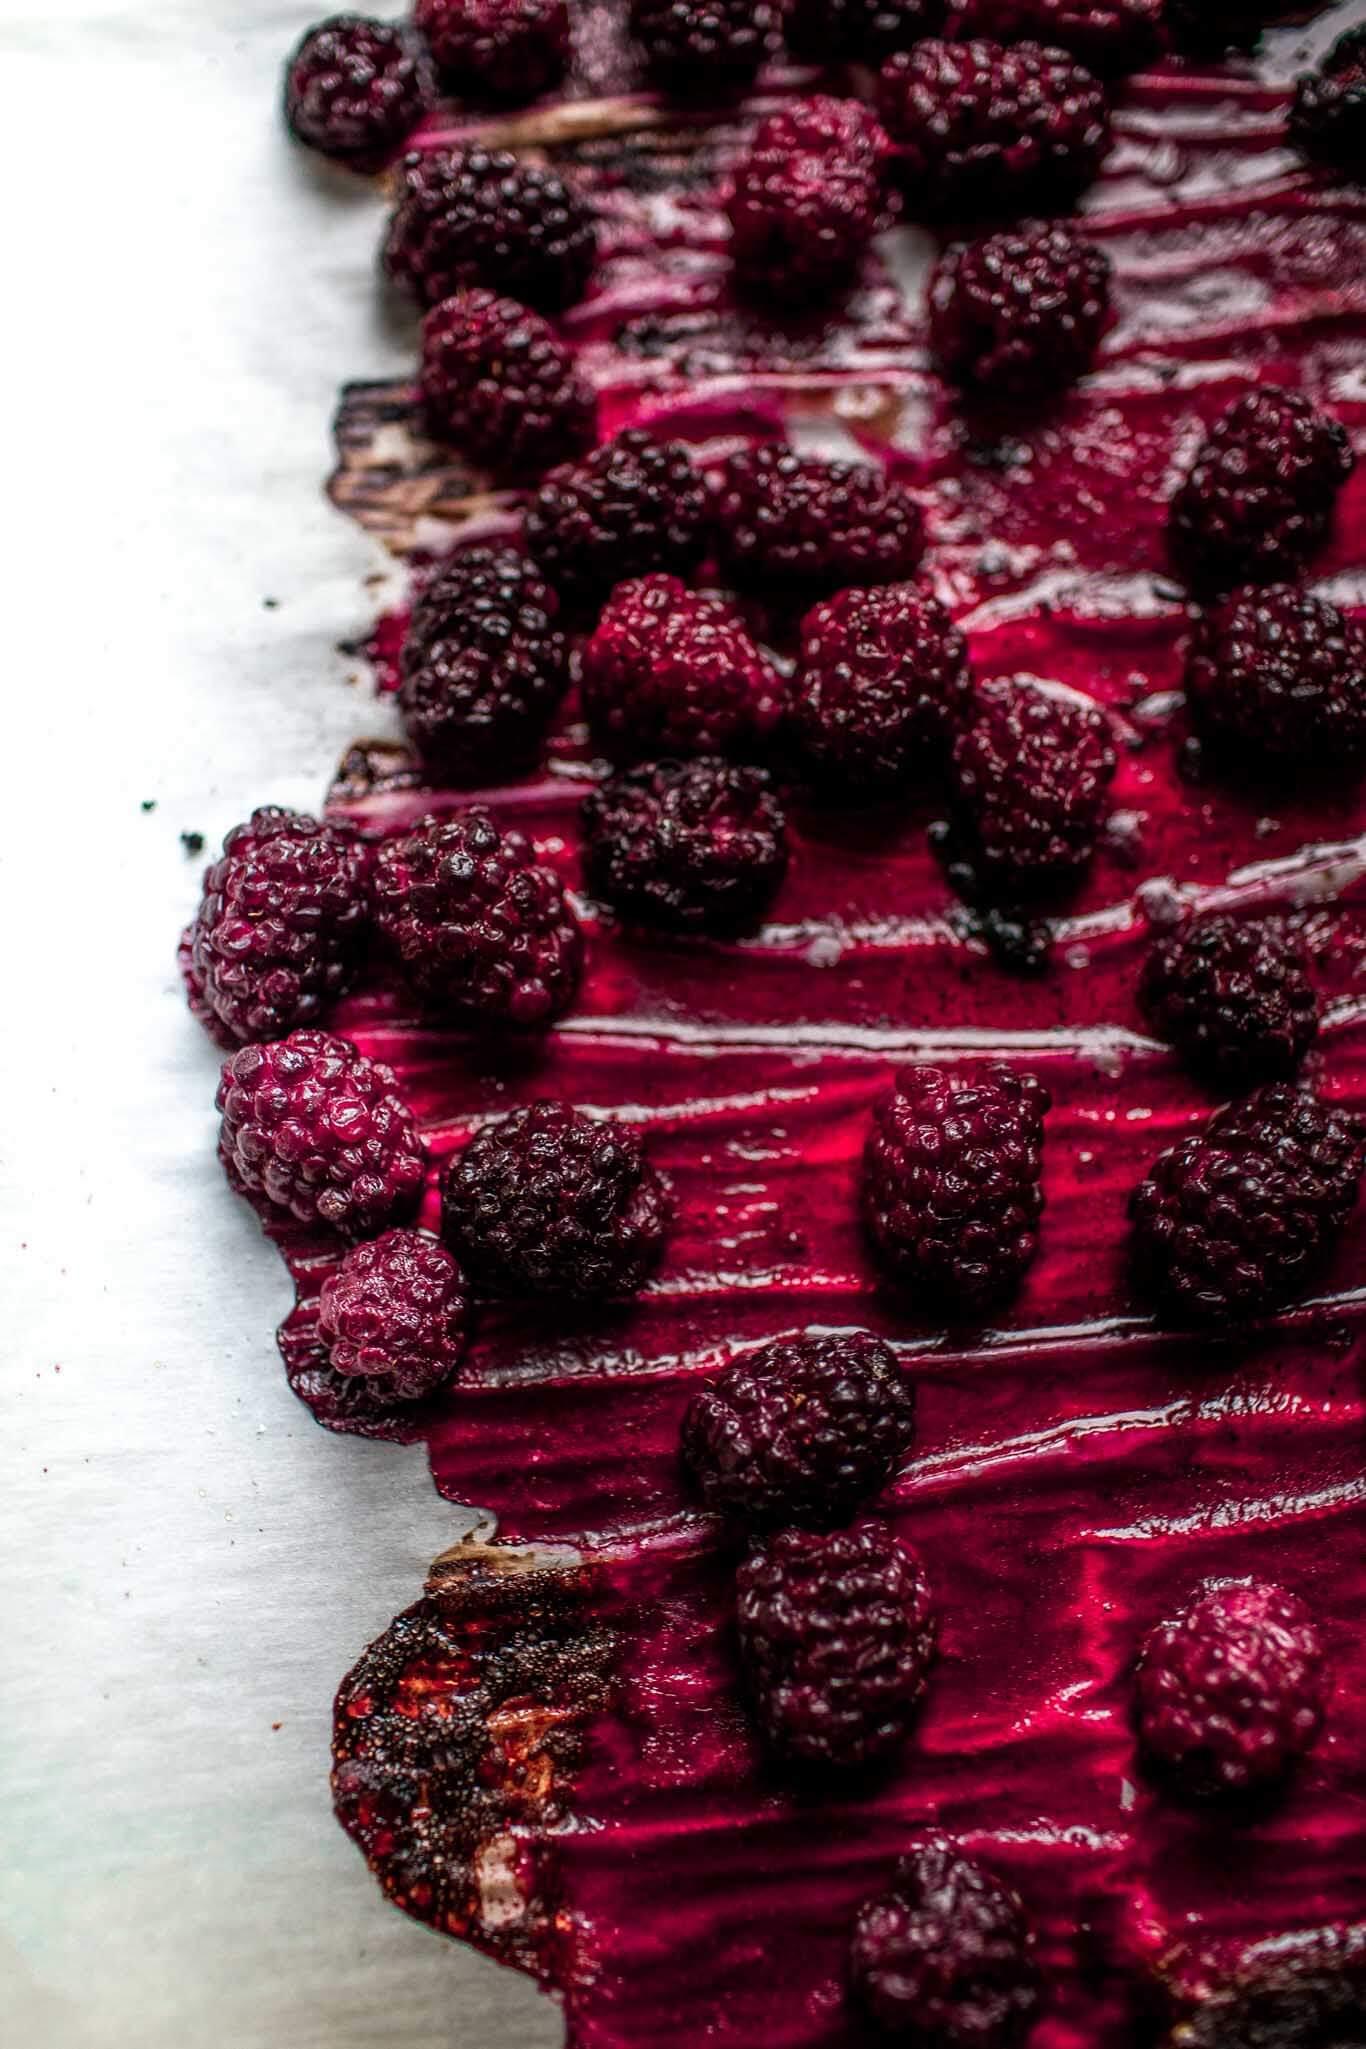 Roasted blackberries on baking sheet.